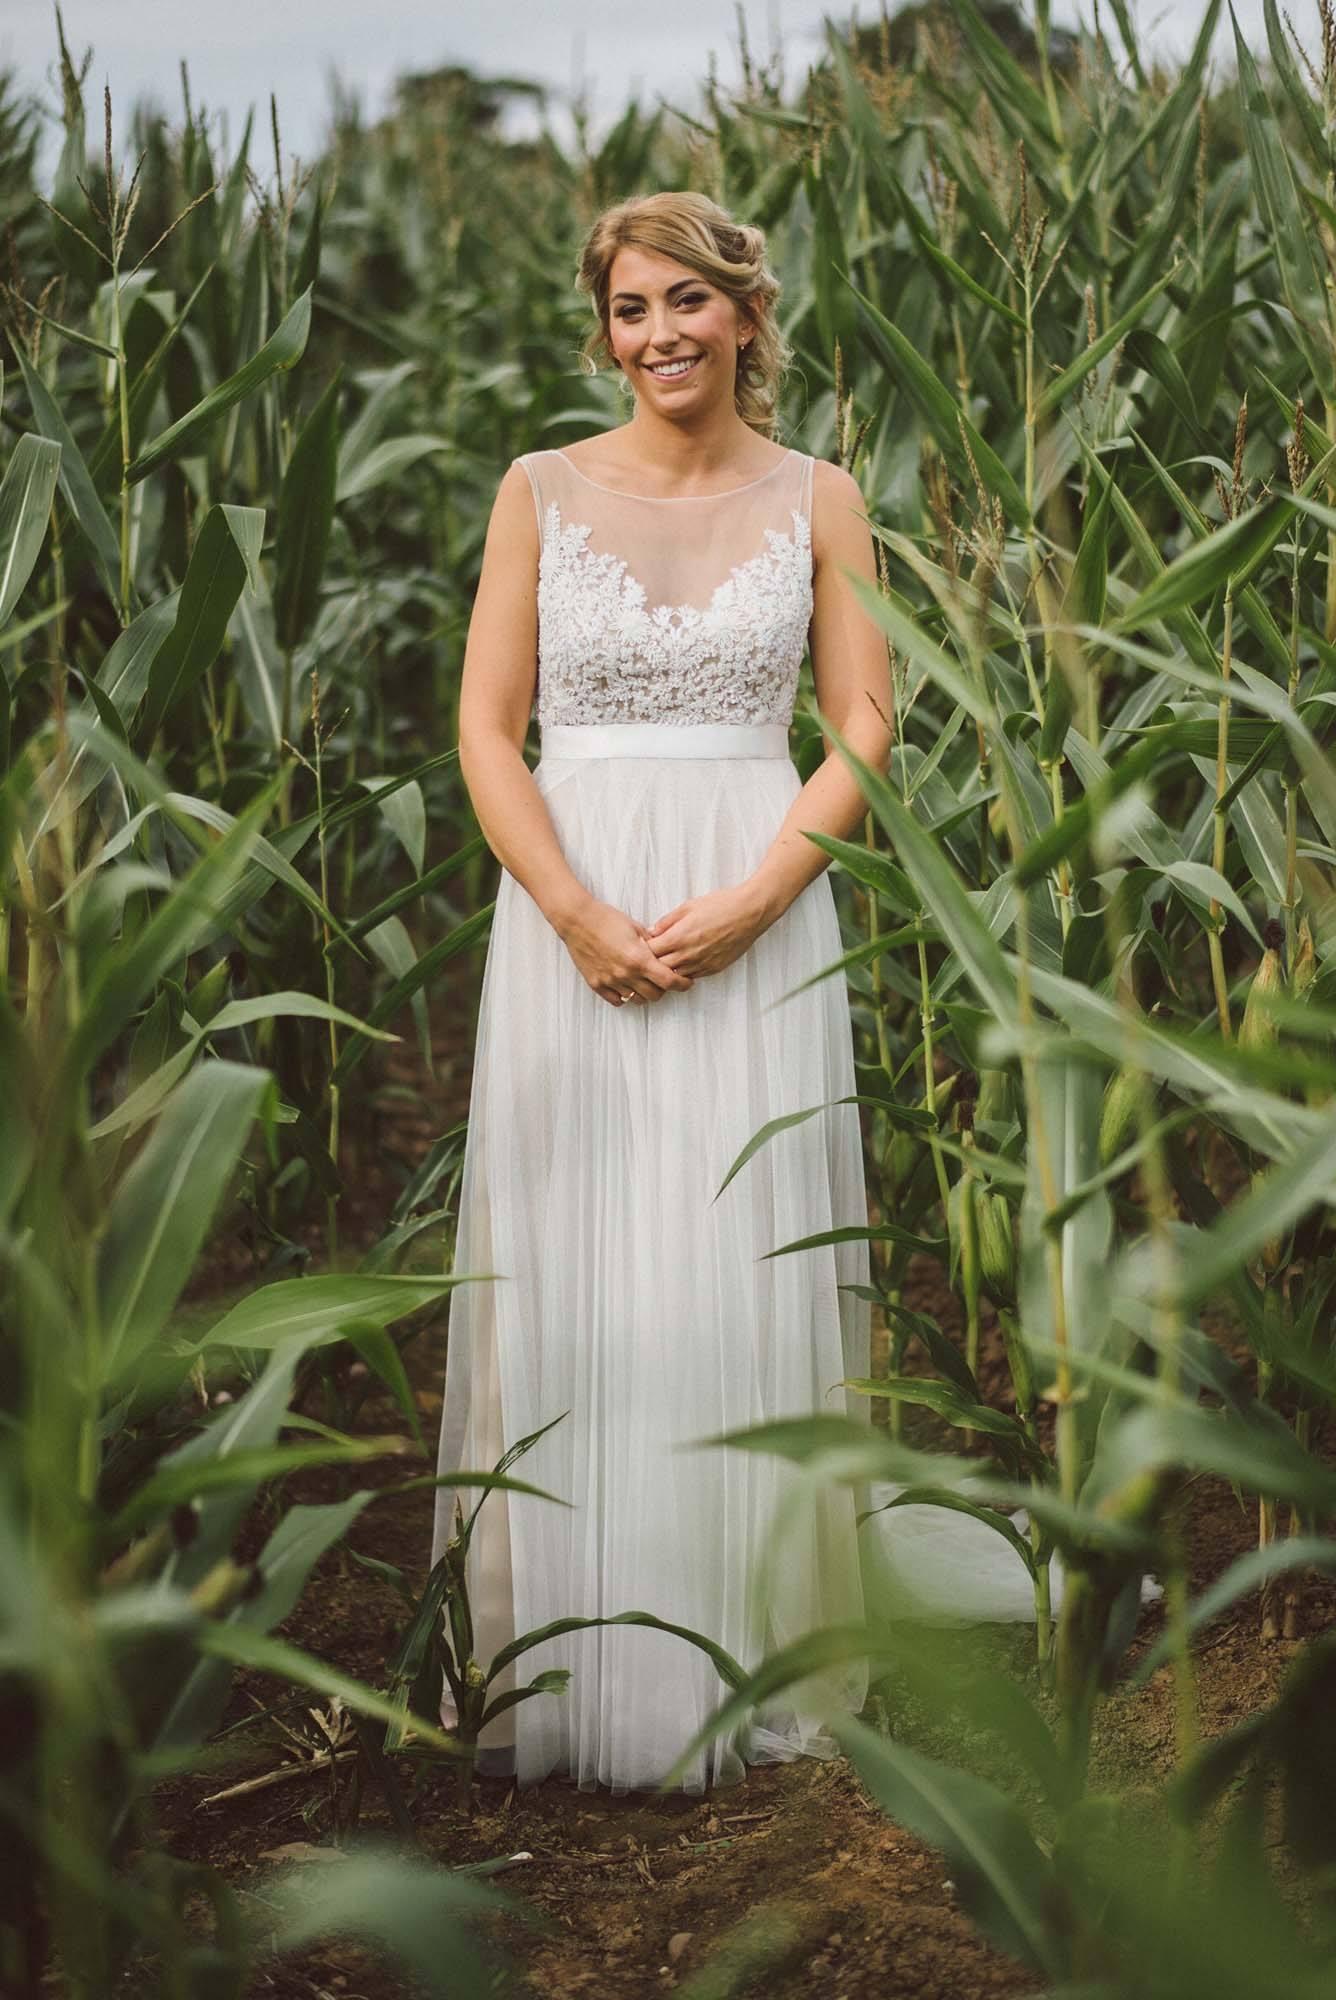 Kedleston Country House wedding photographer